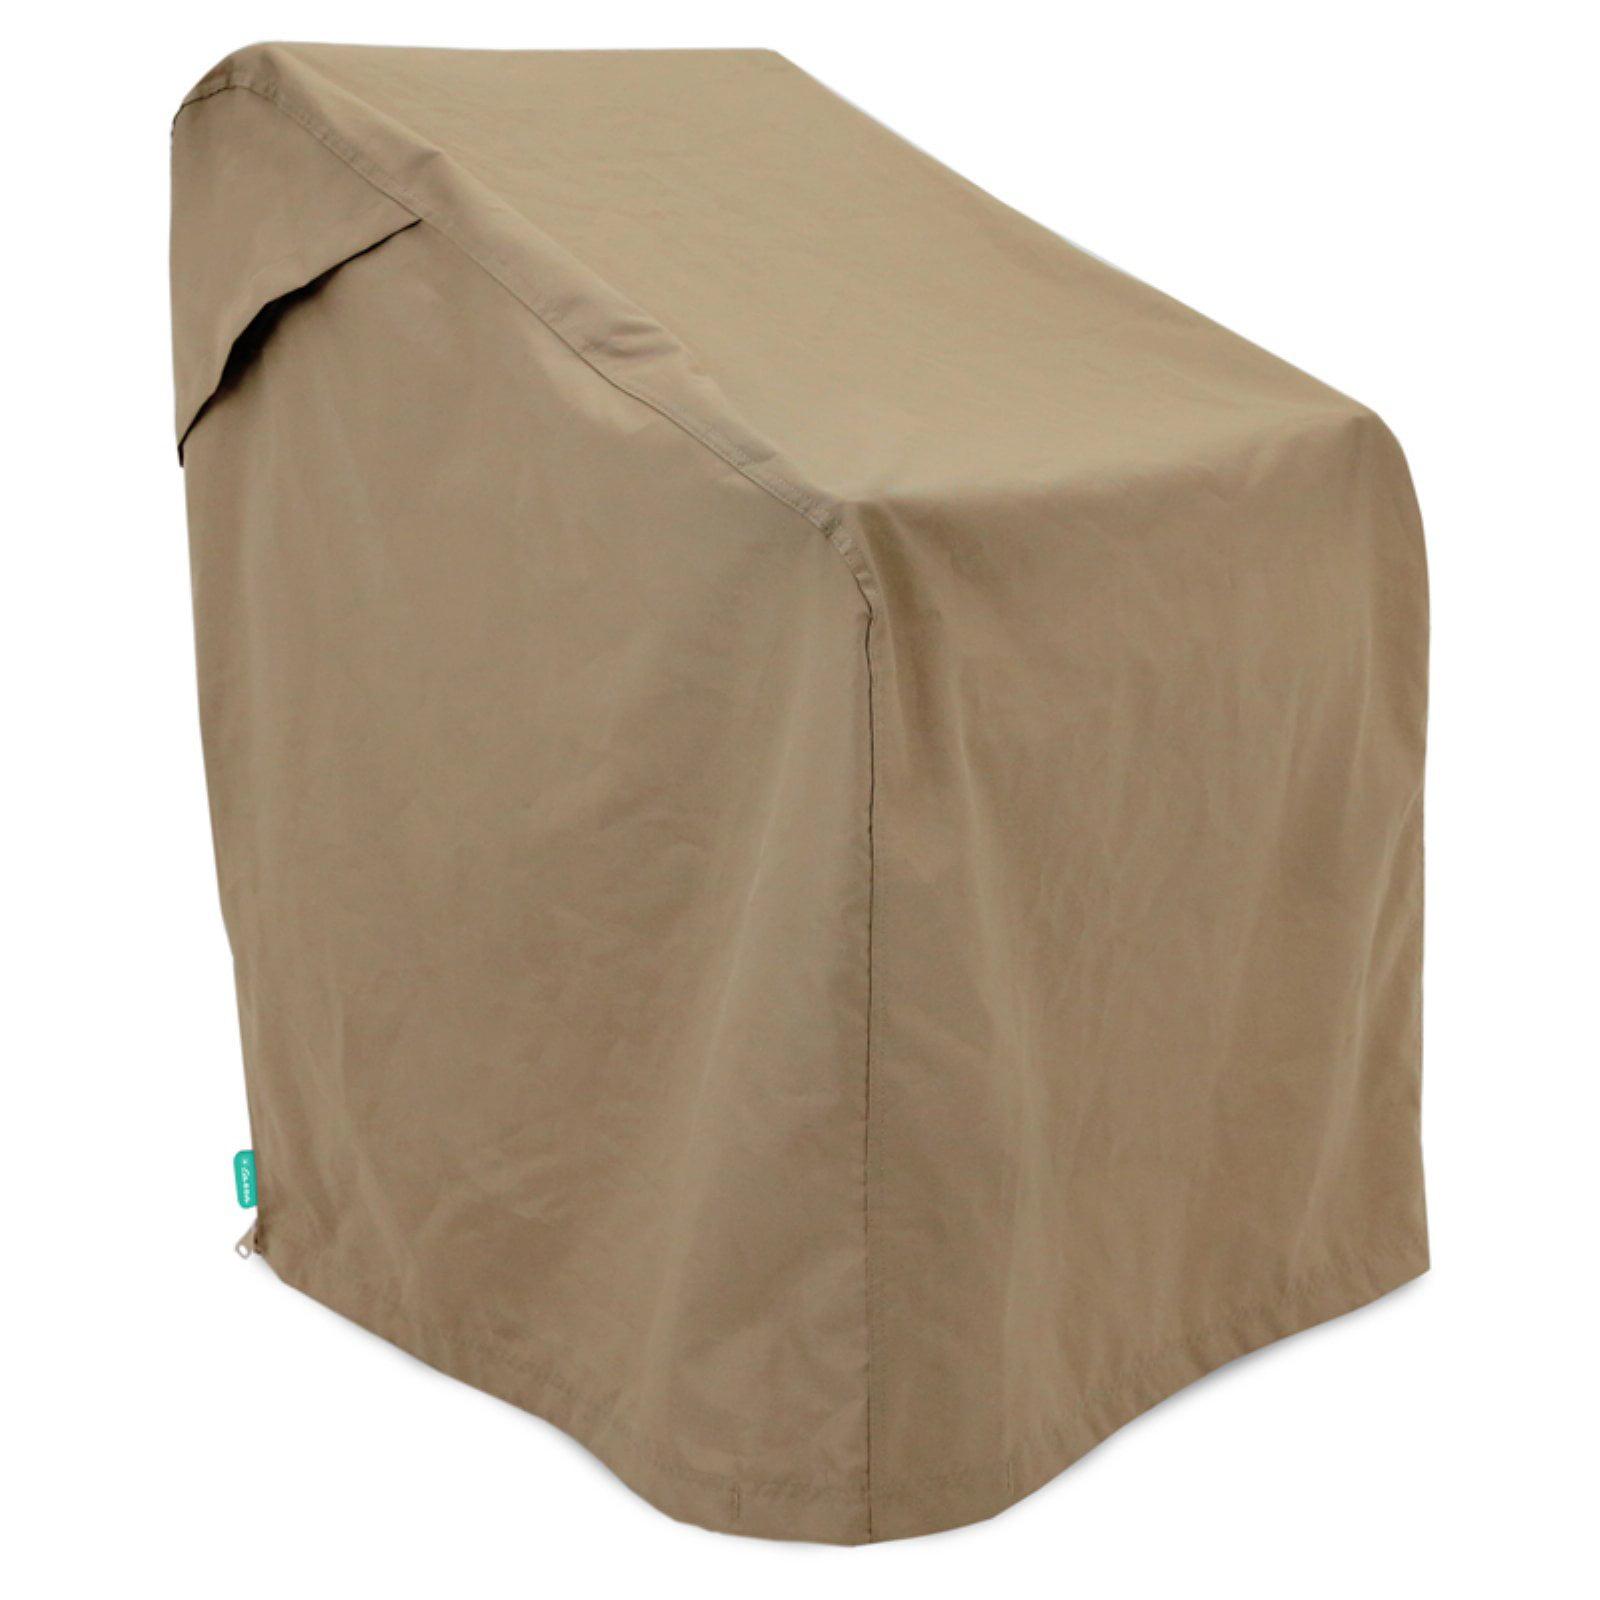 Tarra Home Universal Outdoor UFCCP323235PT Patio Chair Cover